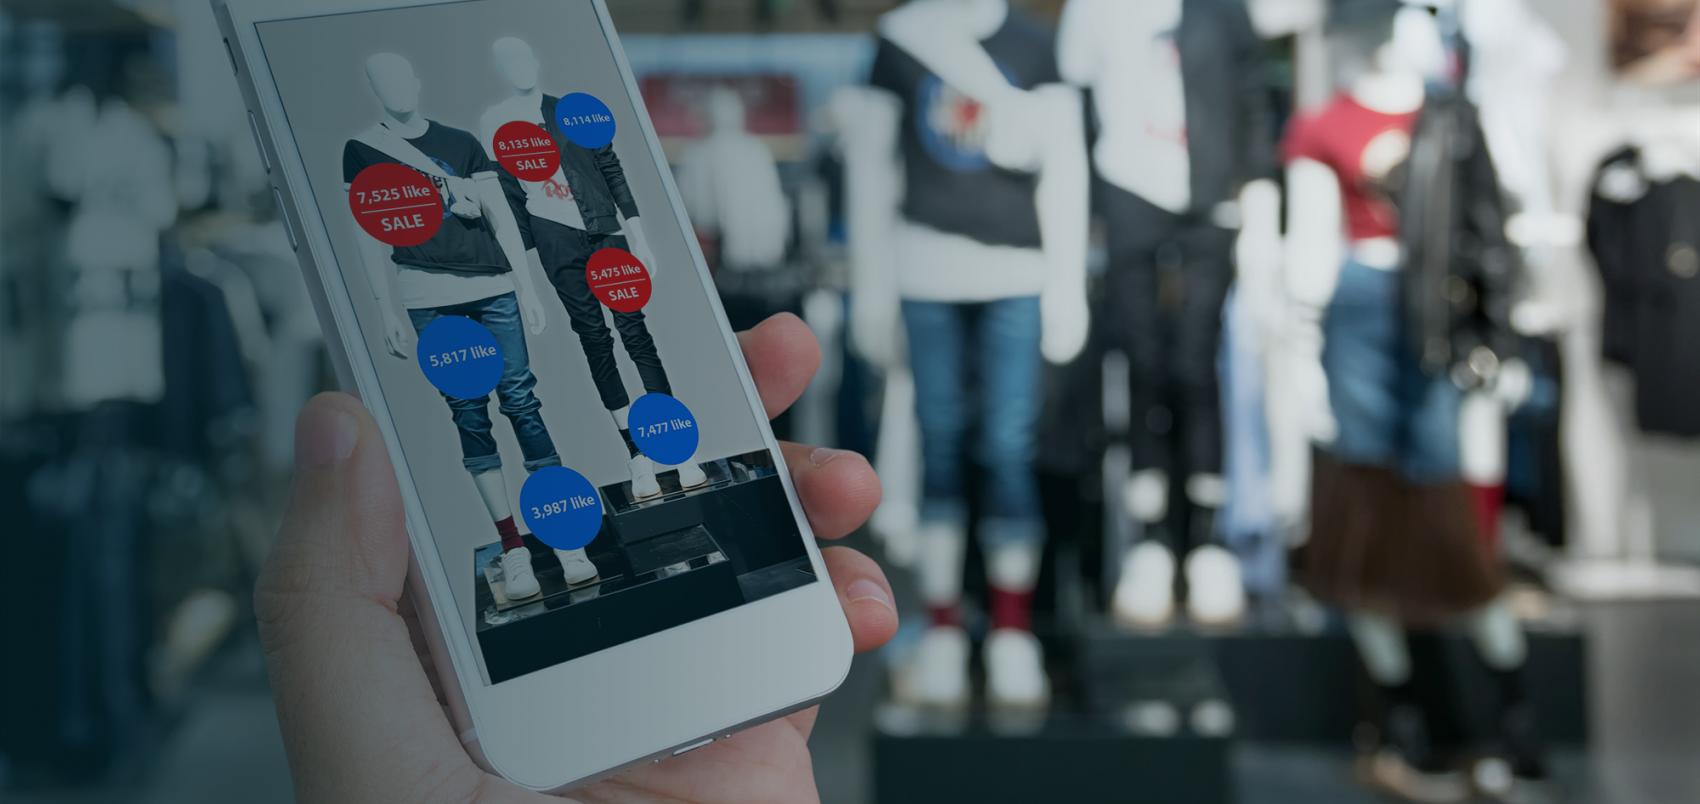 Looking Ahead: What Winning Customer Experiences Will Look Like in 2020